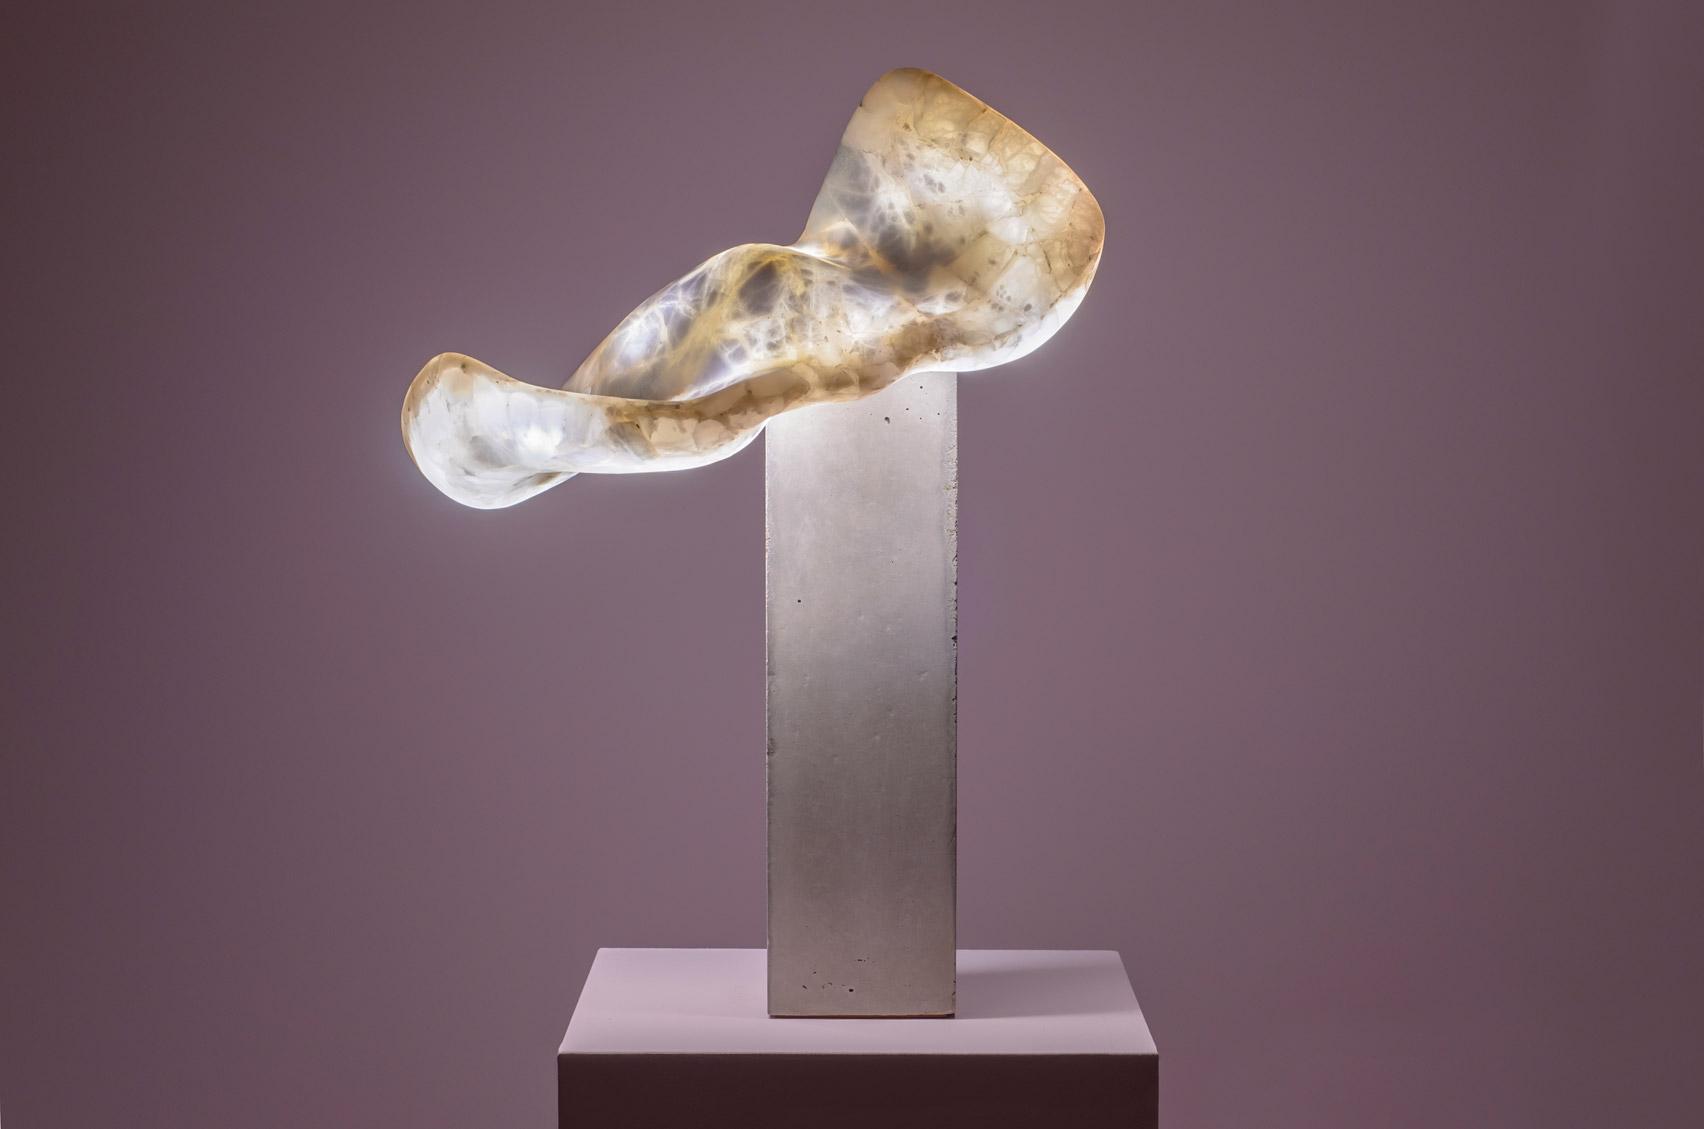 Aqua Fossil lamp by Amarist Studio